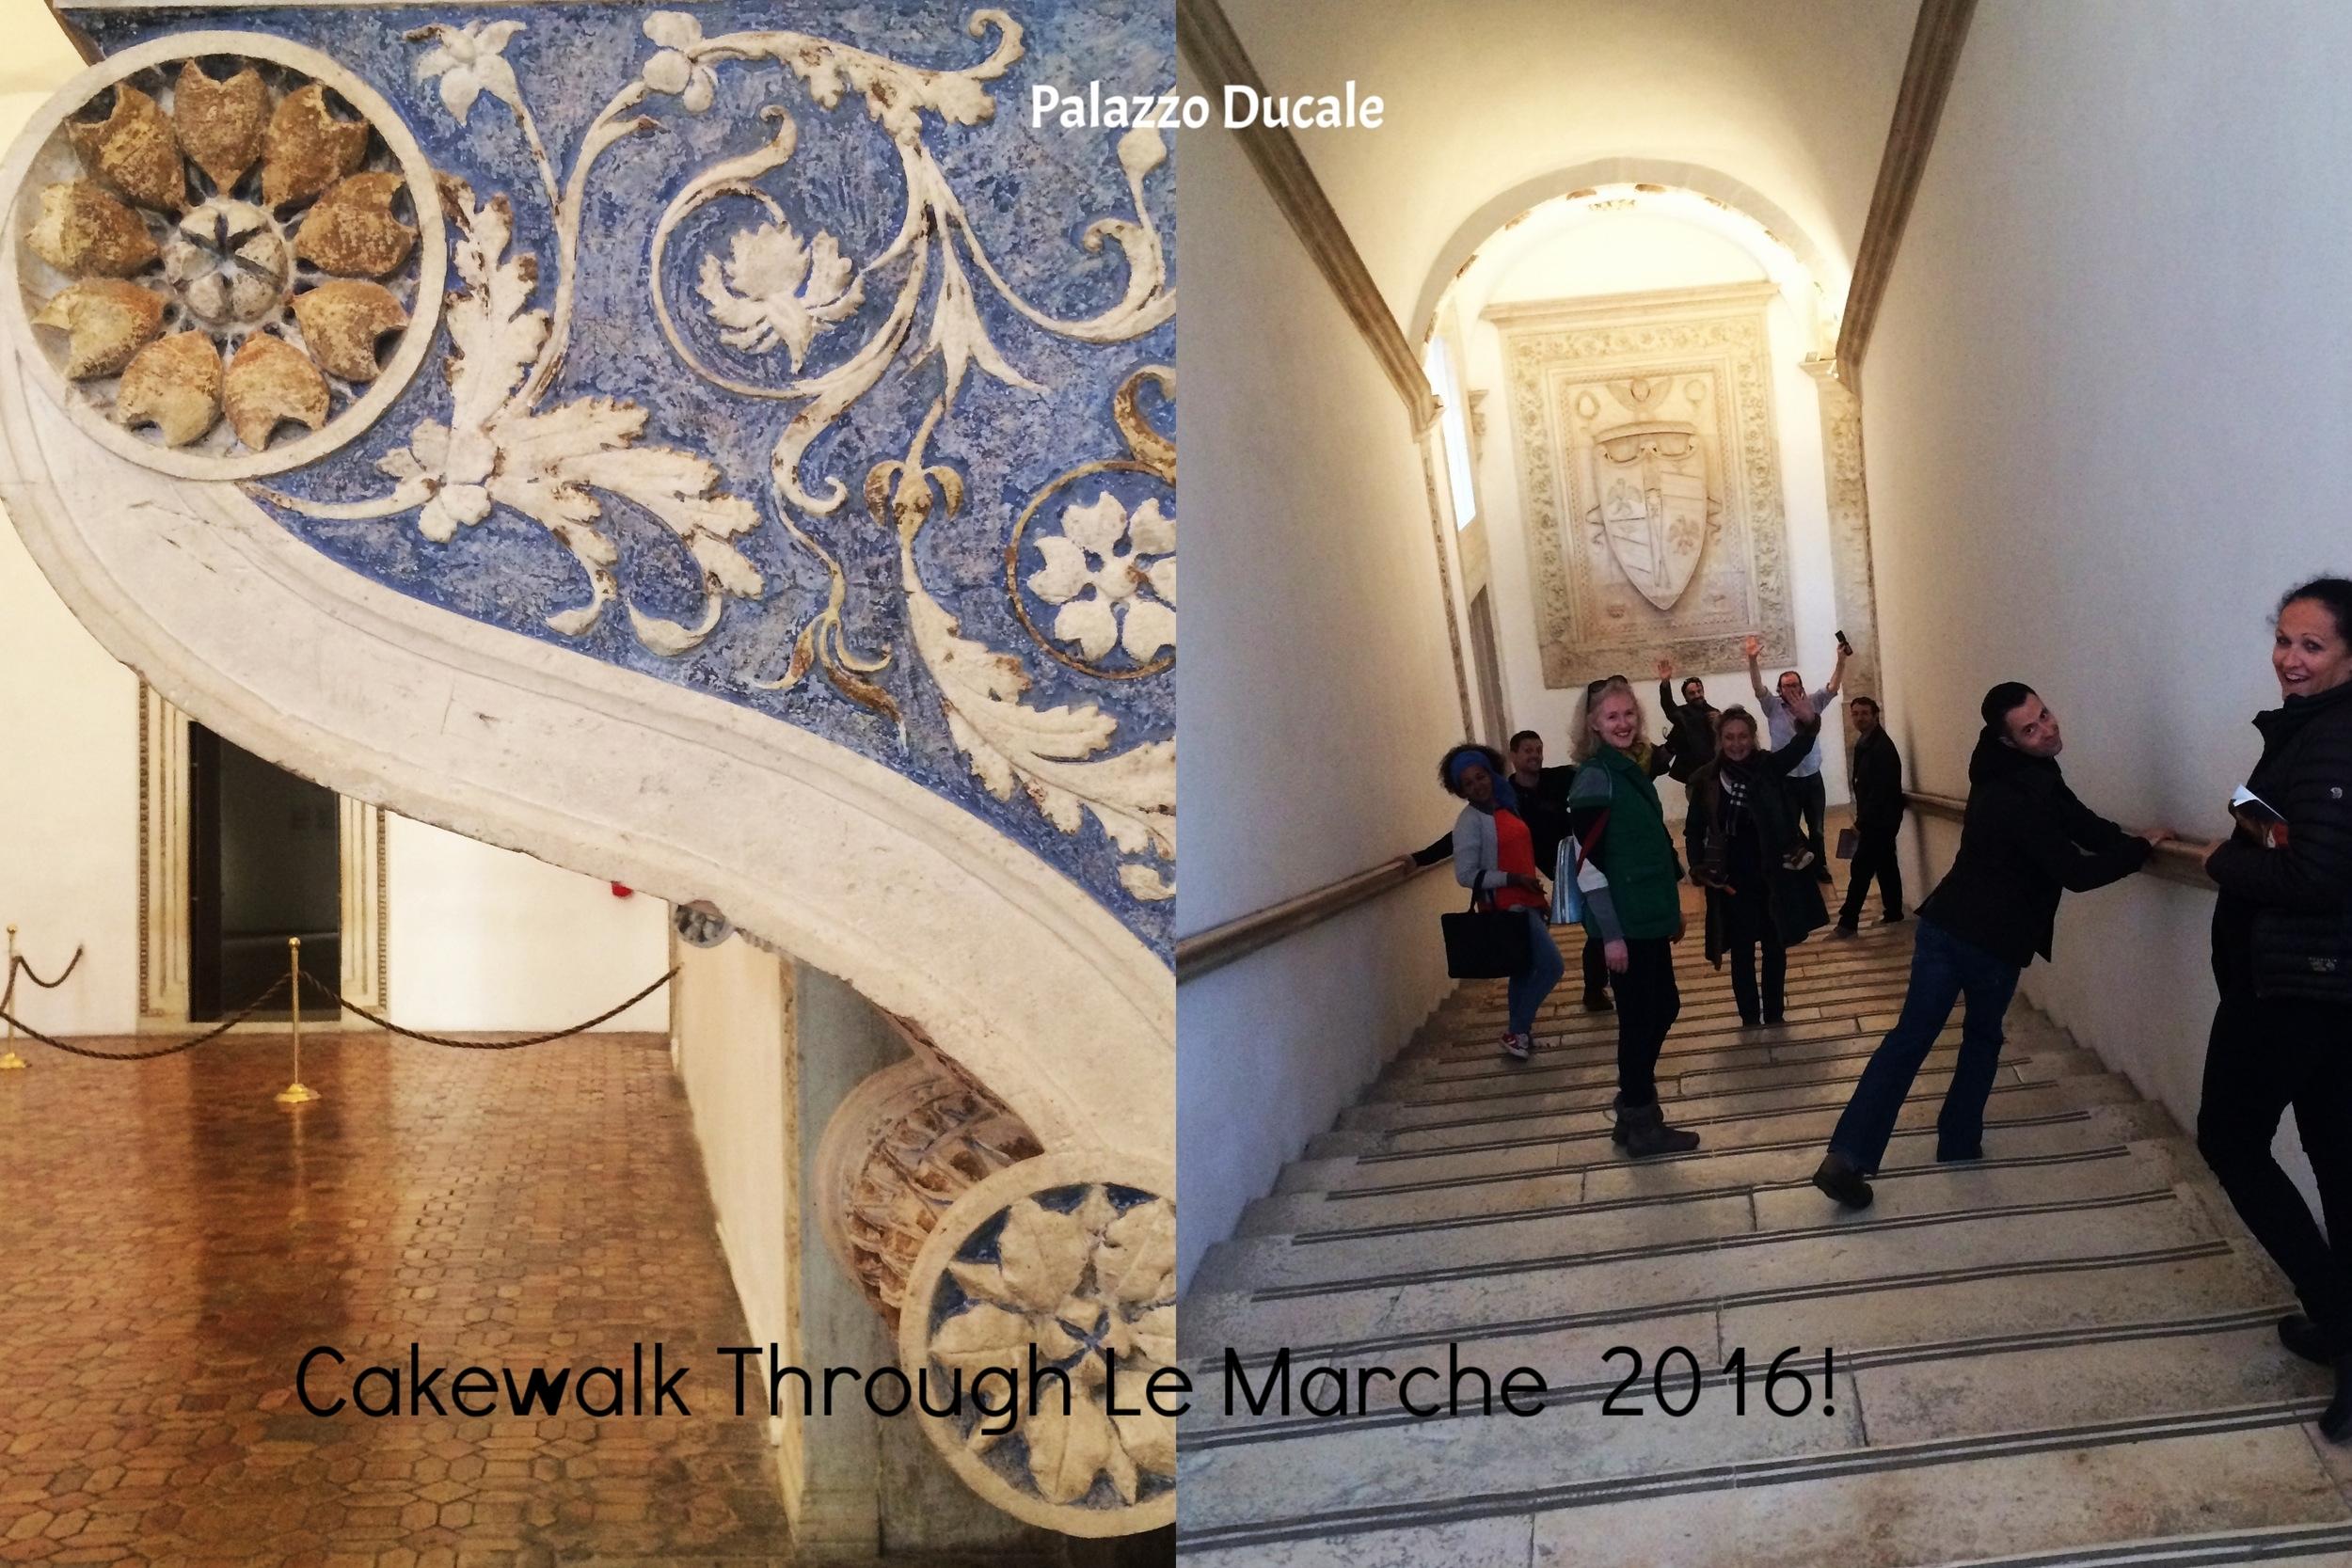 02-cakewalk montefeltro21.jpg